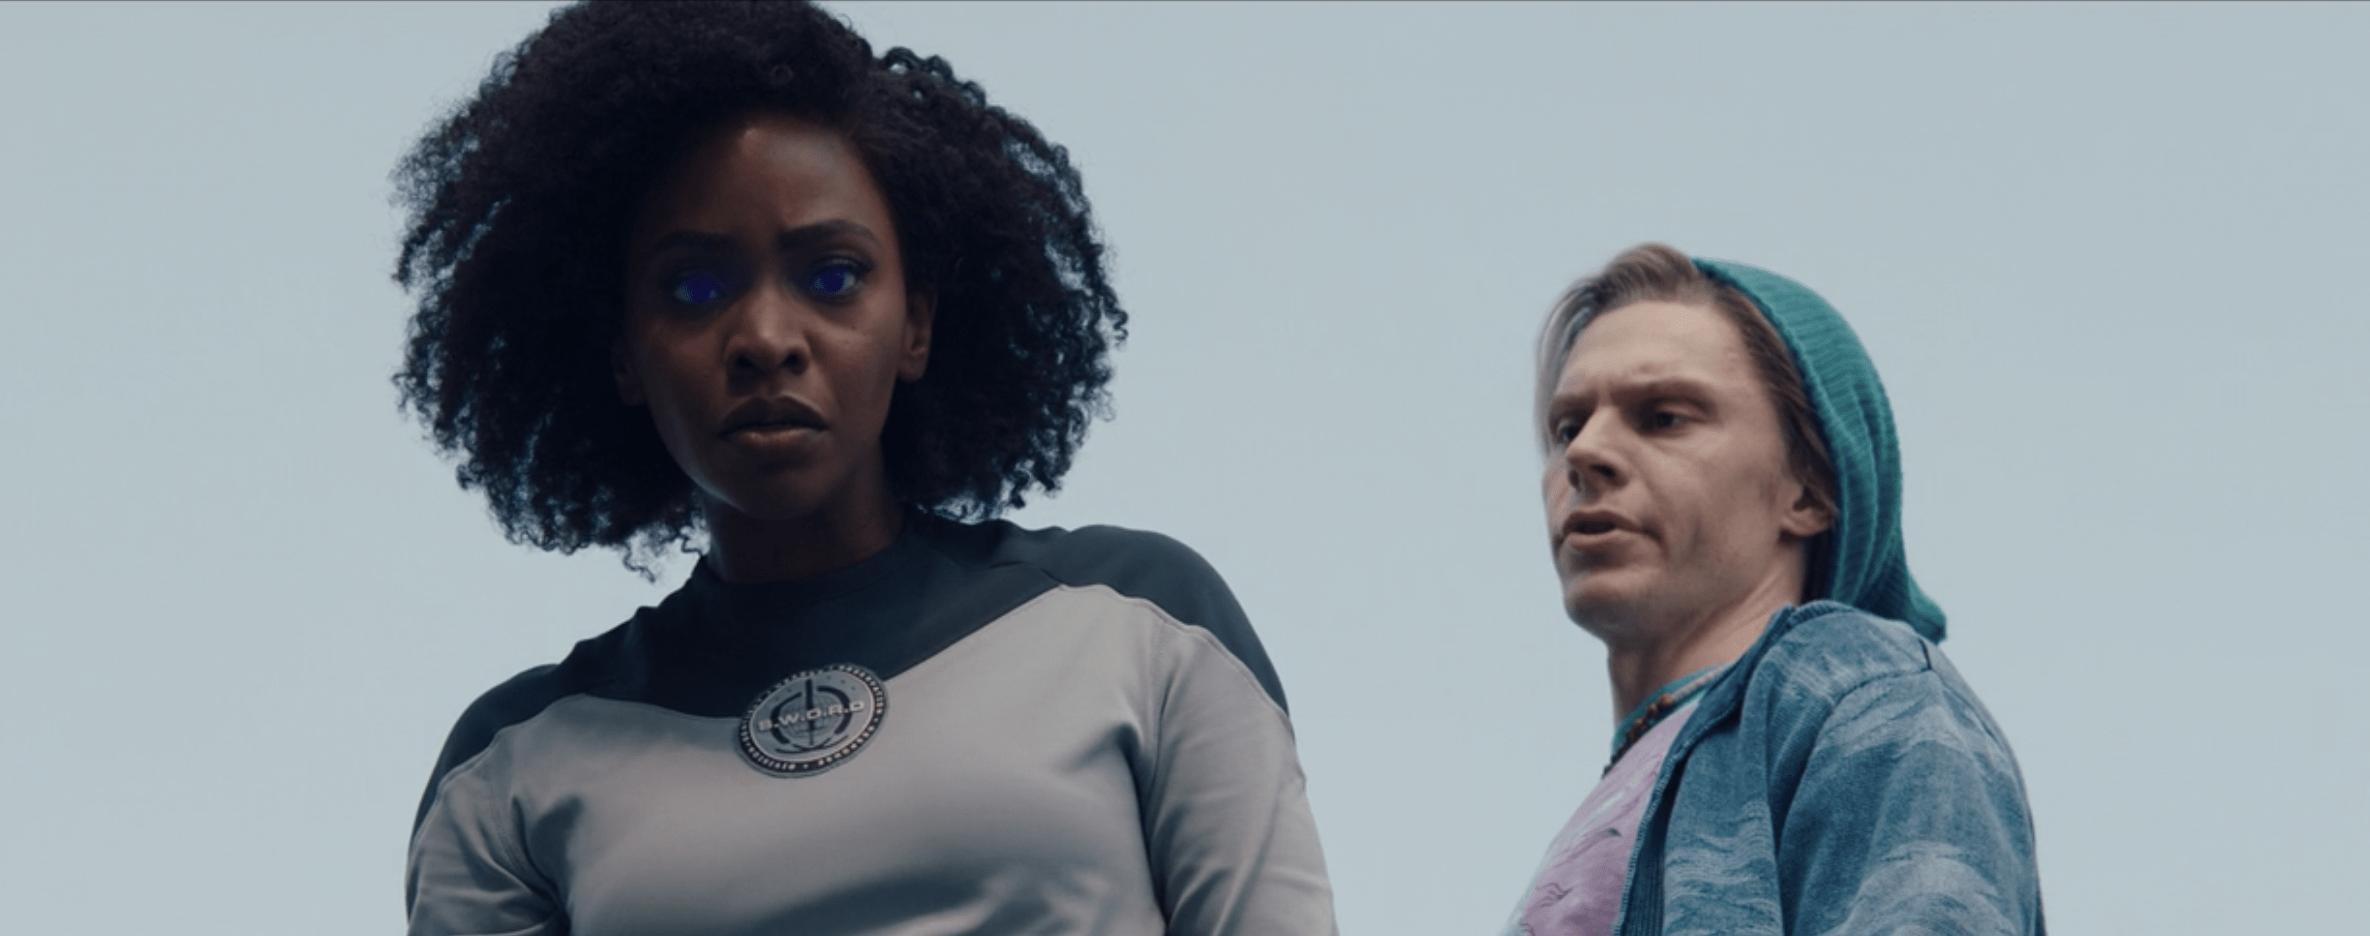 WandaVision Episode 7 post credit scene